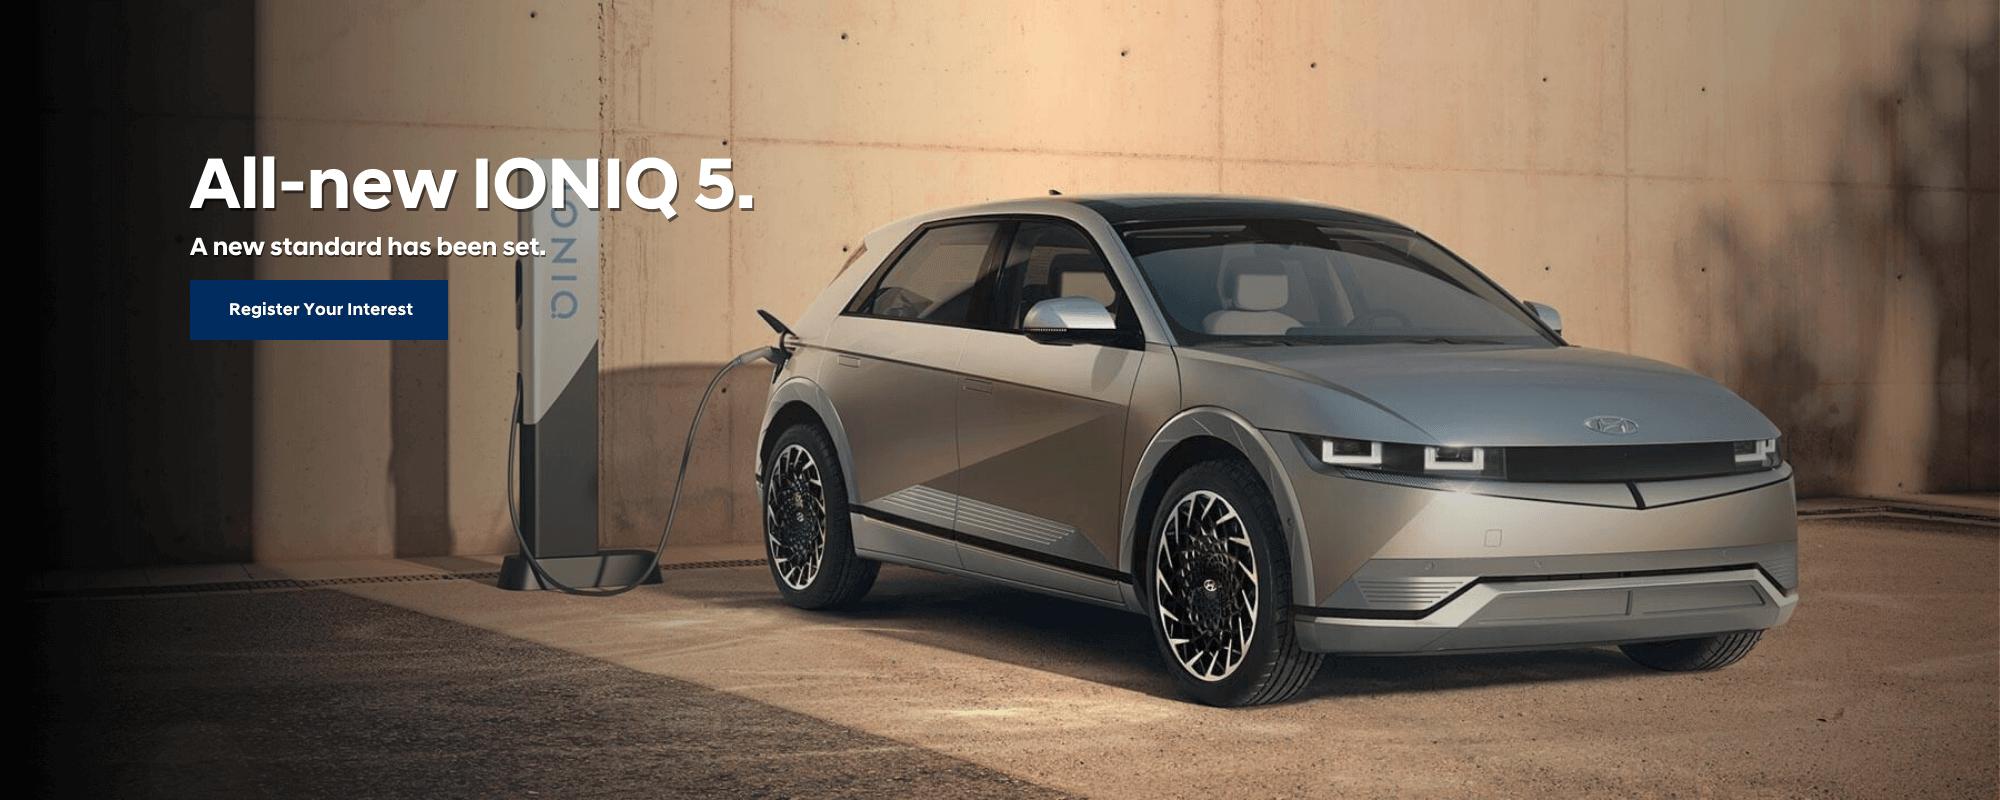 Coming Soon: Hyundai IONIQ 5. A new standard has been set.